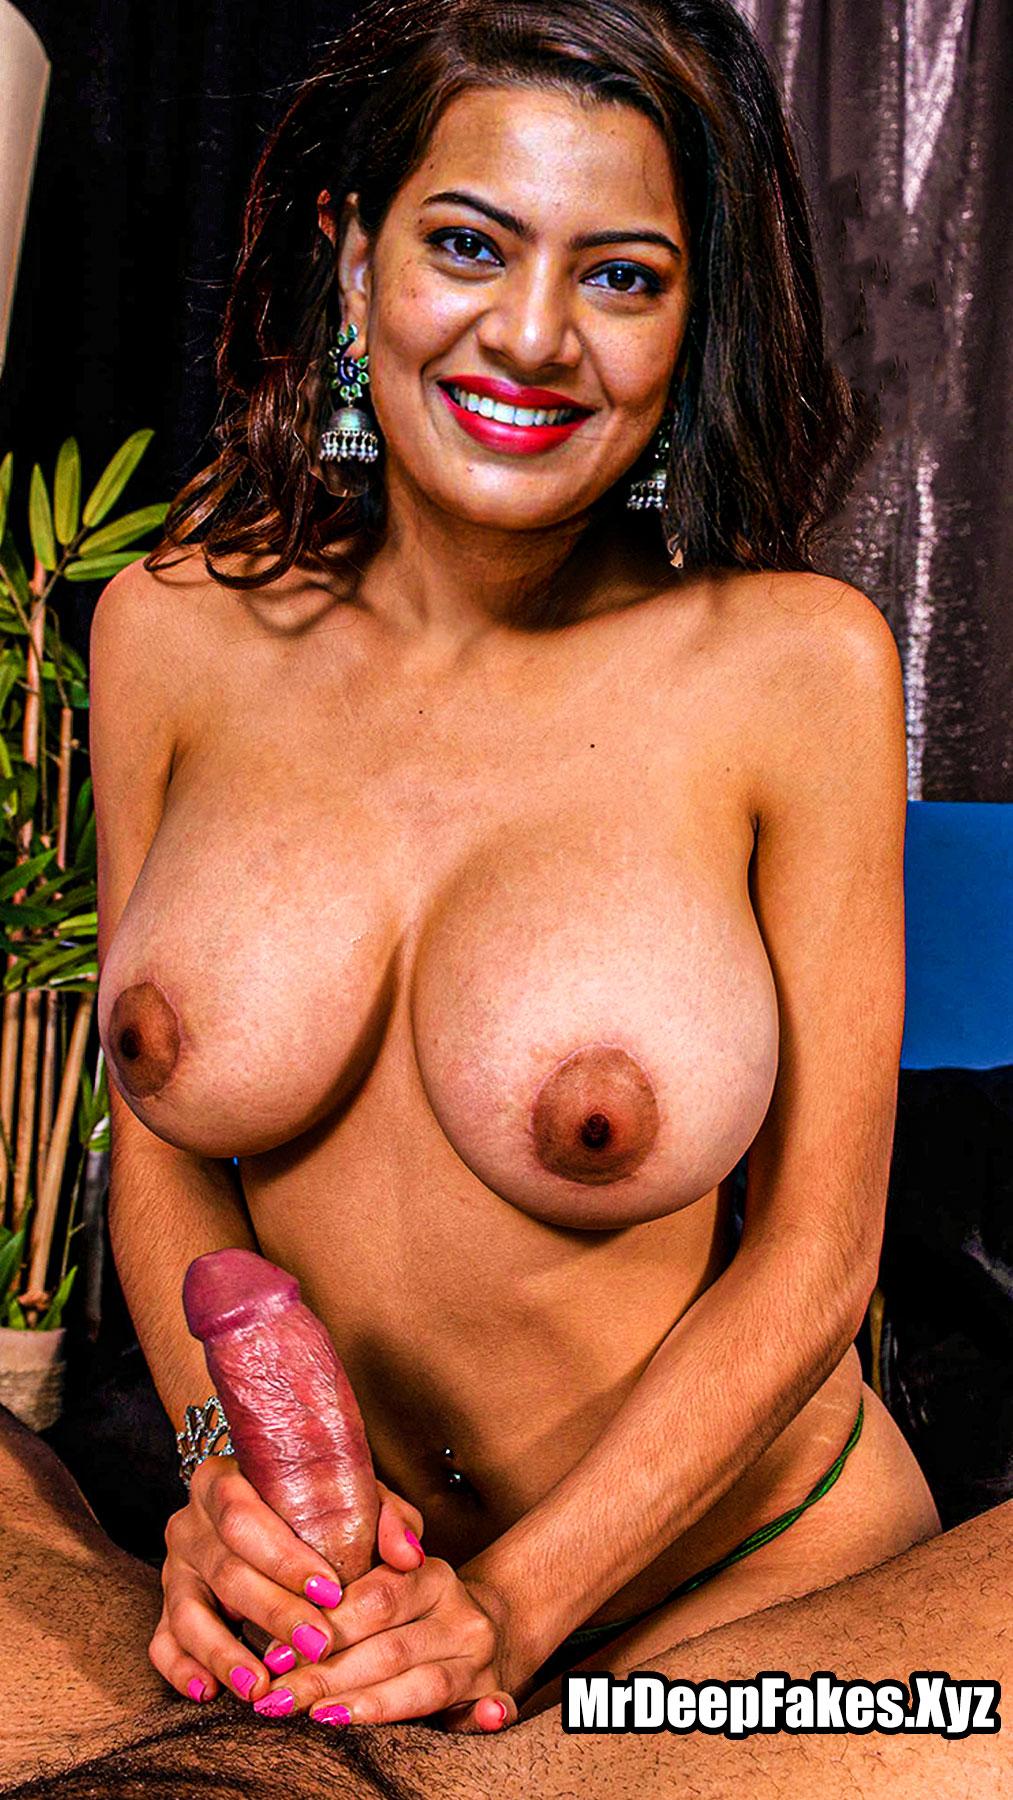 Big Boobs Singer Geetha Madhuri handjob fakes topless pic